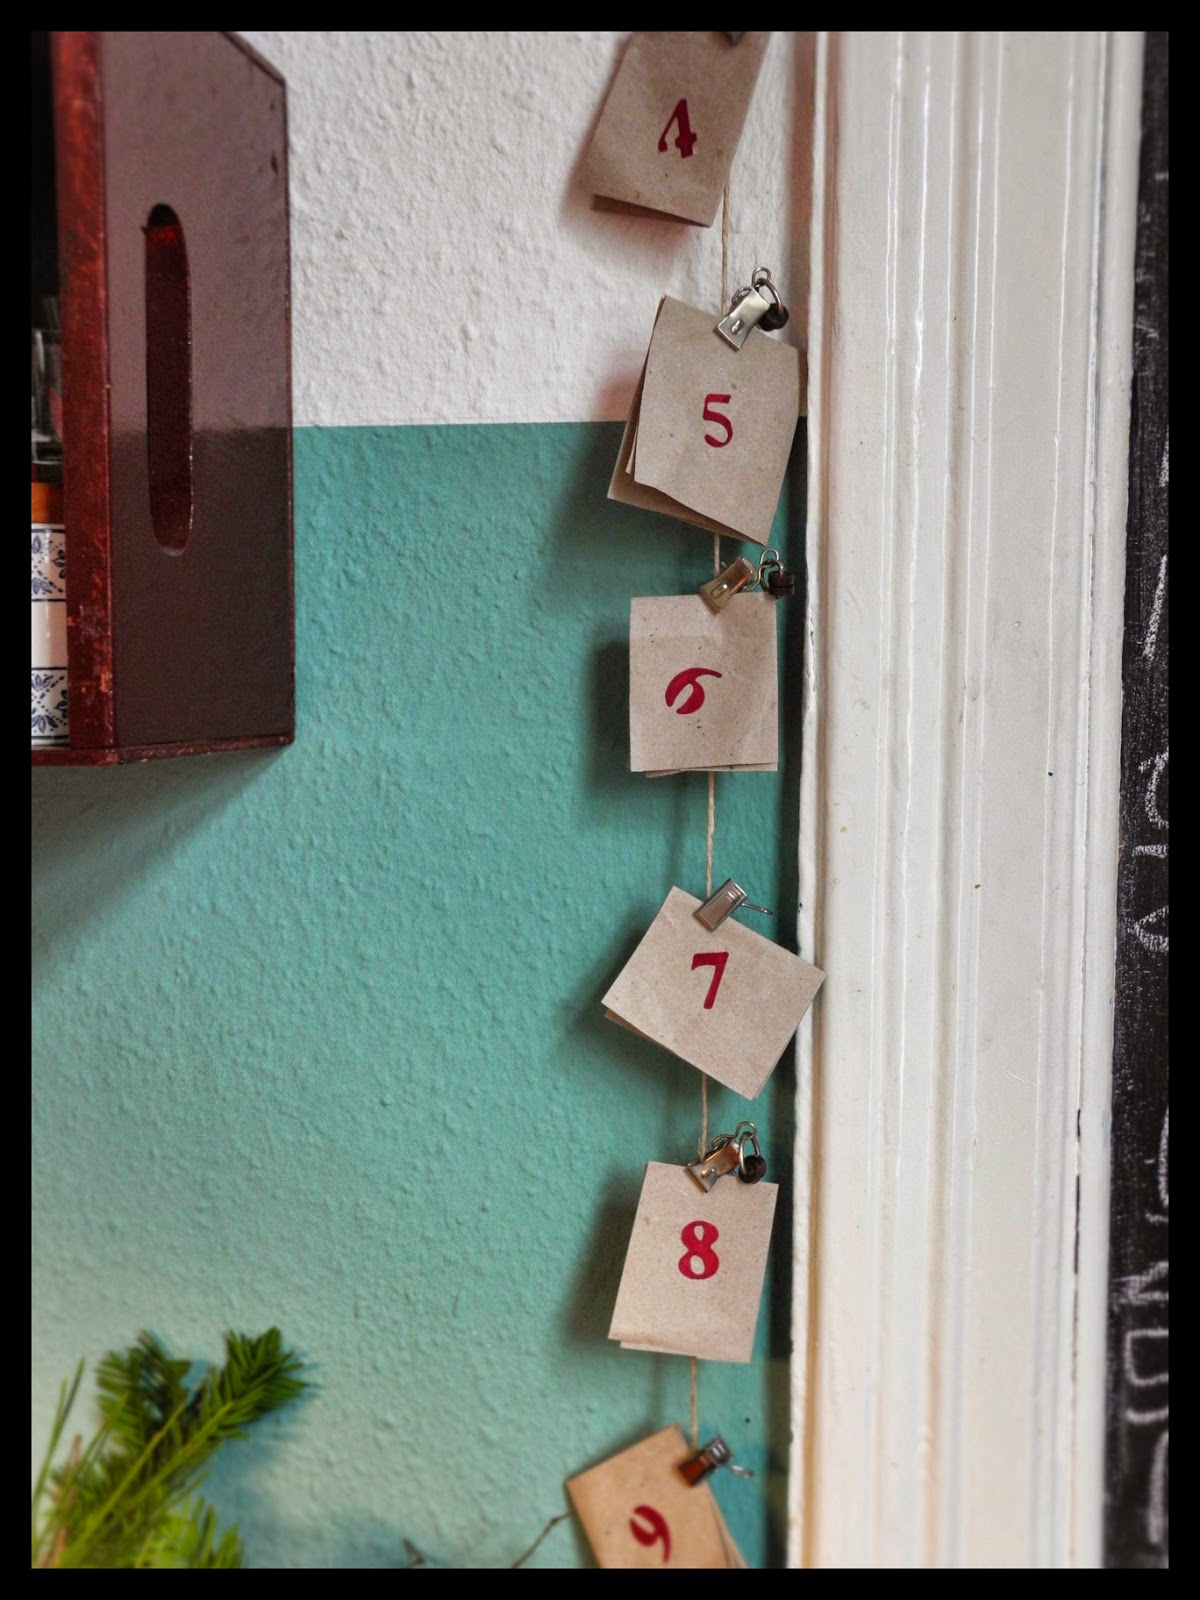 diy ausb chser in adventskalender mit r tseln oder. Black Bedroom Furniture Sets. Home Design Ideas